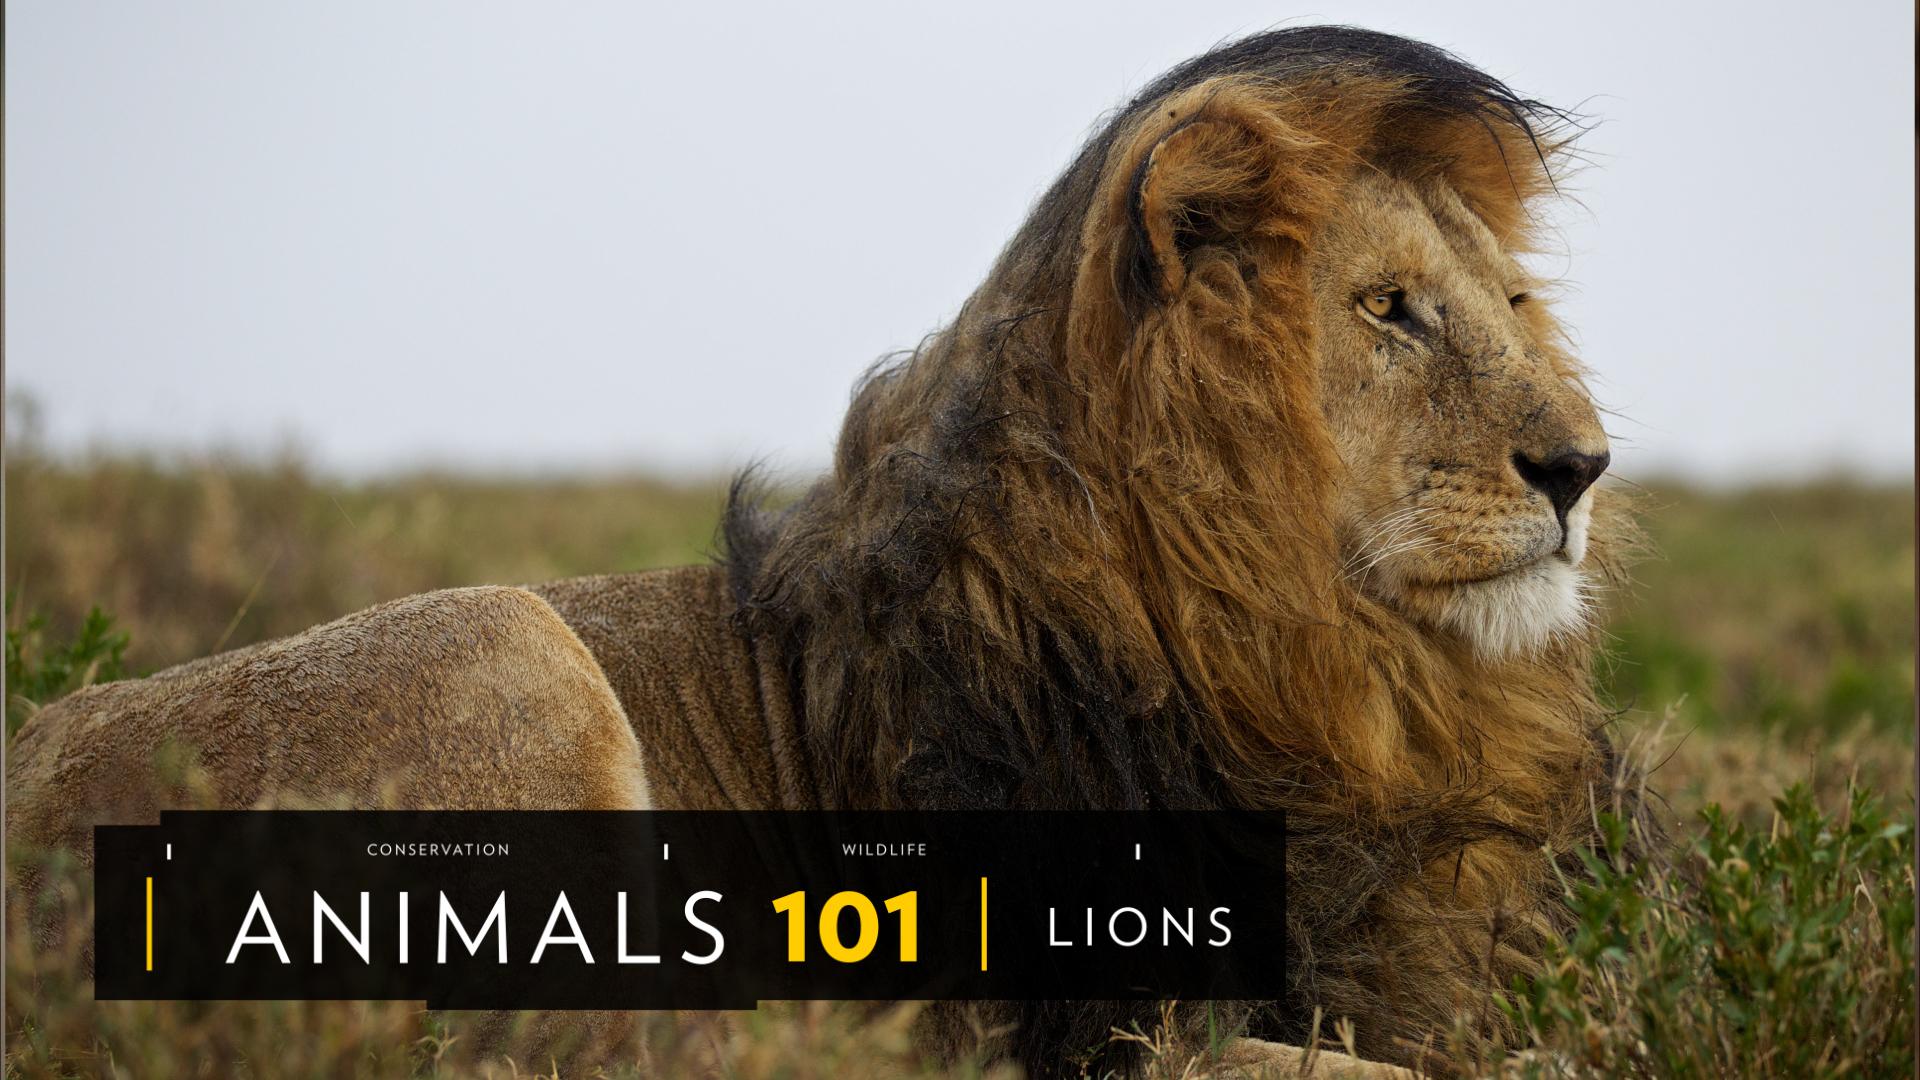 lions - photo #24